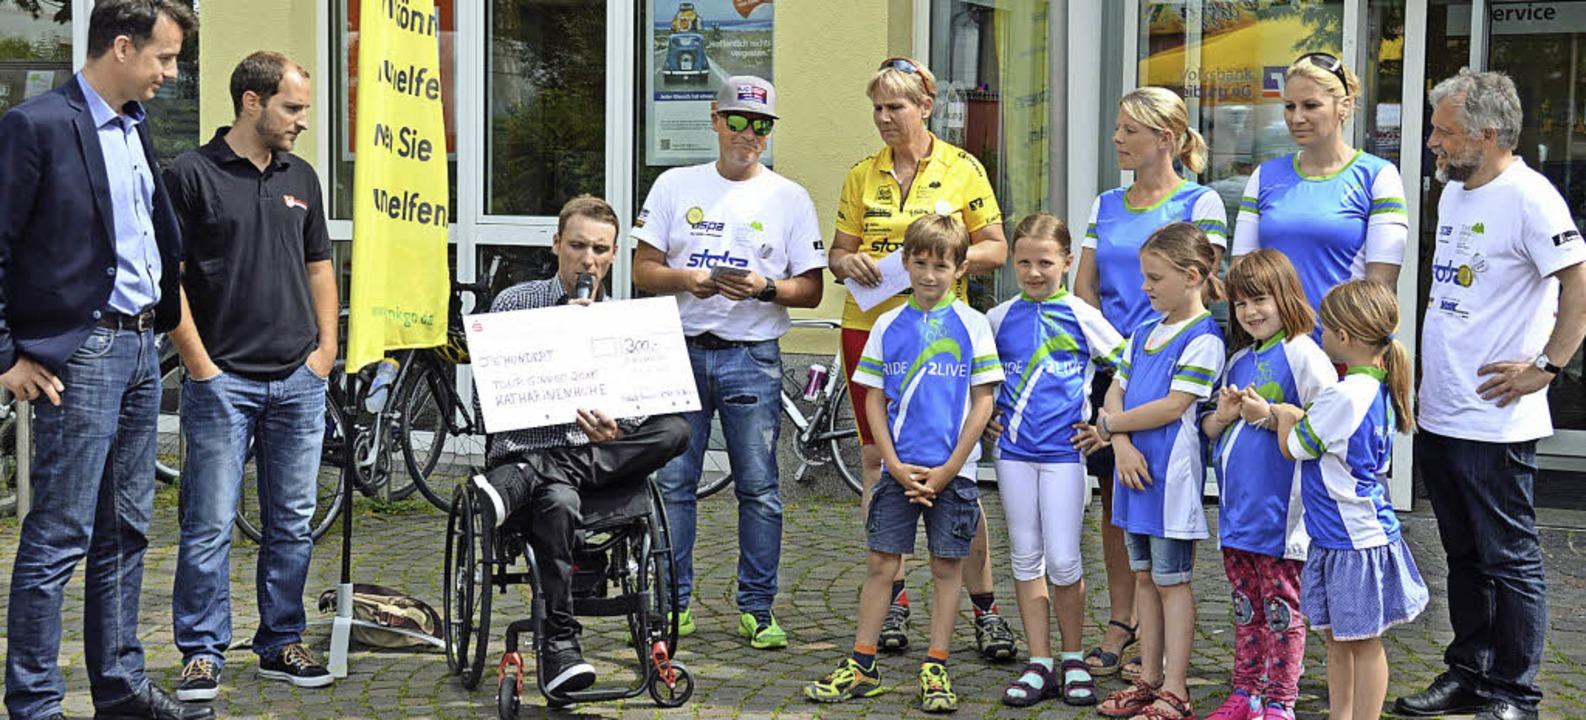 "Bürgermeister Andreas Hall (links) emp...inkgo-Tour"" auf dem Marktplatz.   | Foto: Gerhard Lück"